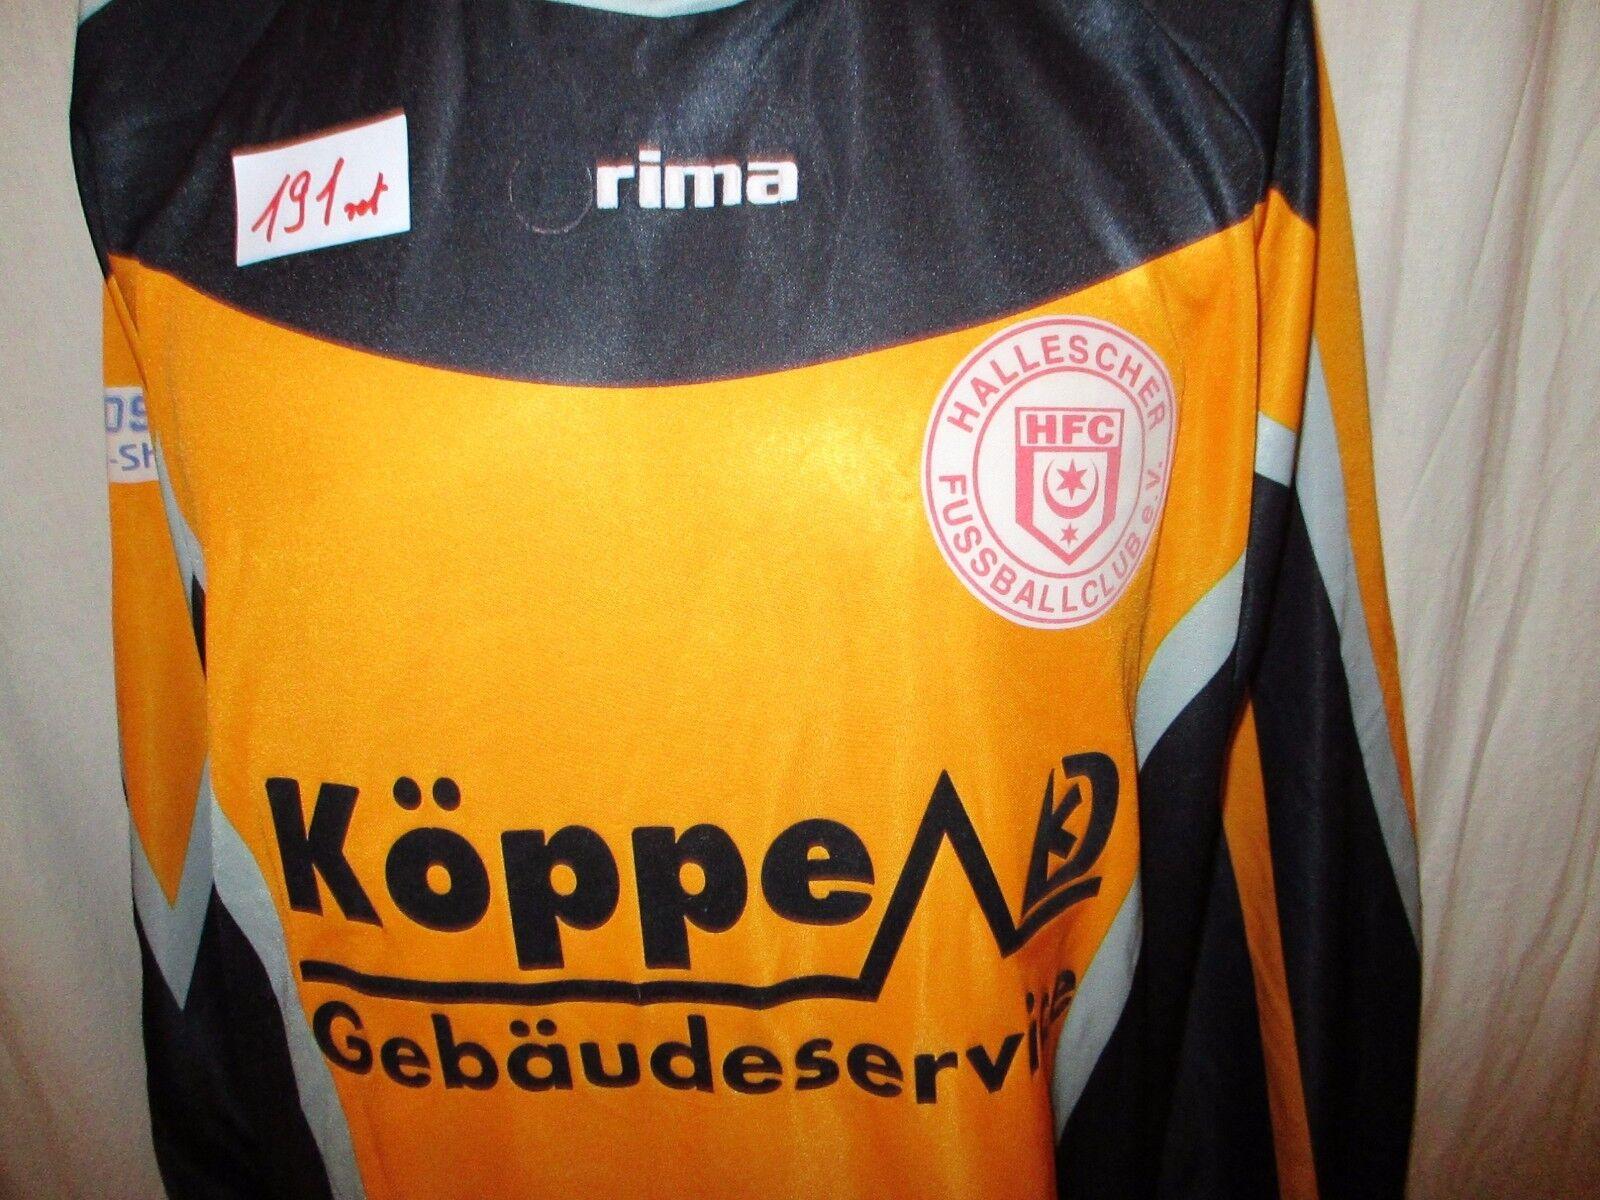 Hallescher FC erima Matchworn Torwart Matchworn erima Trikot